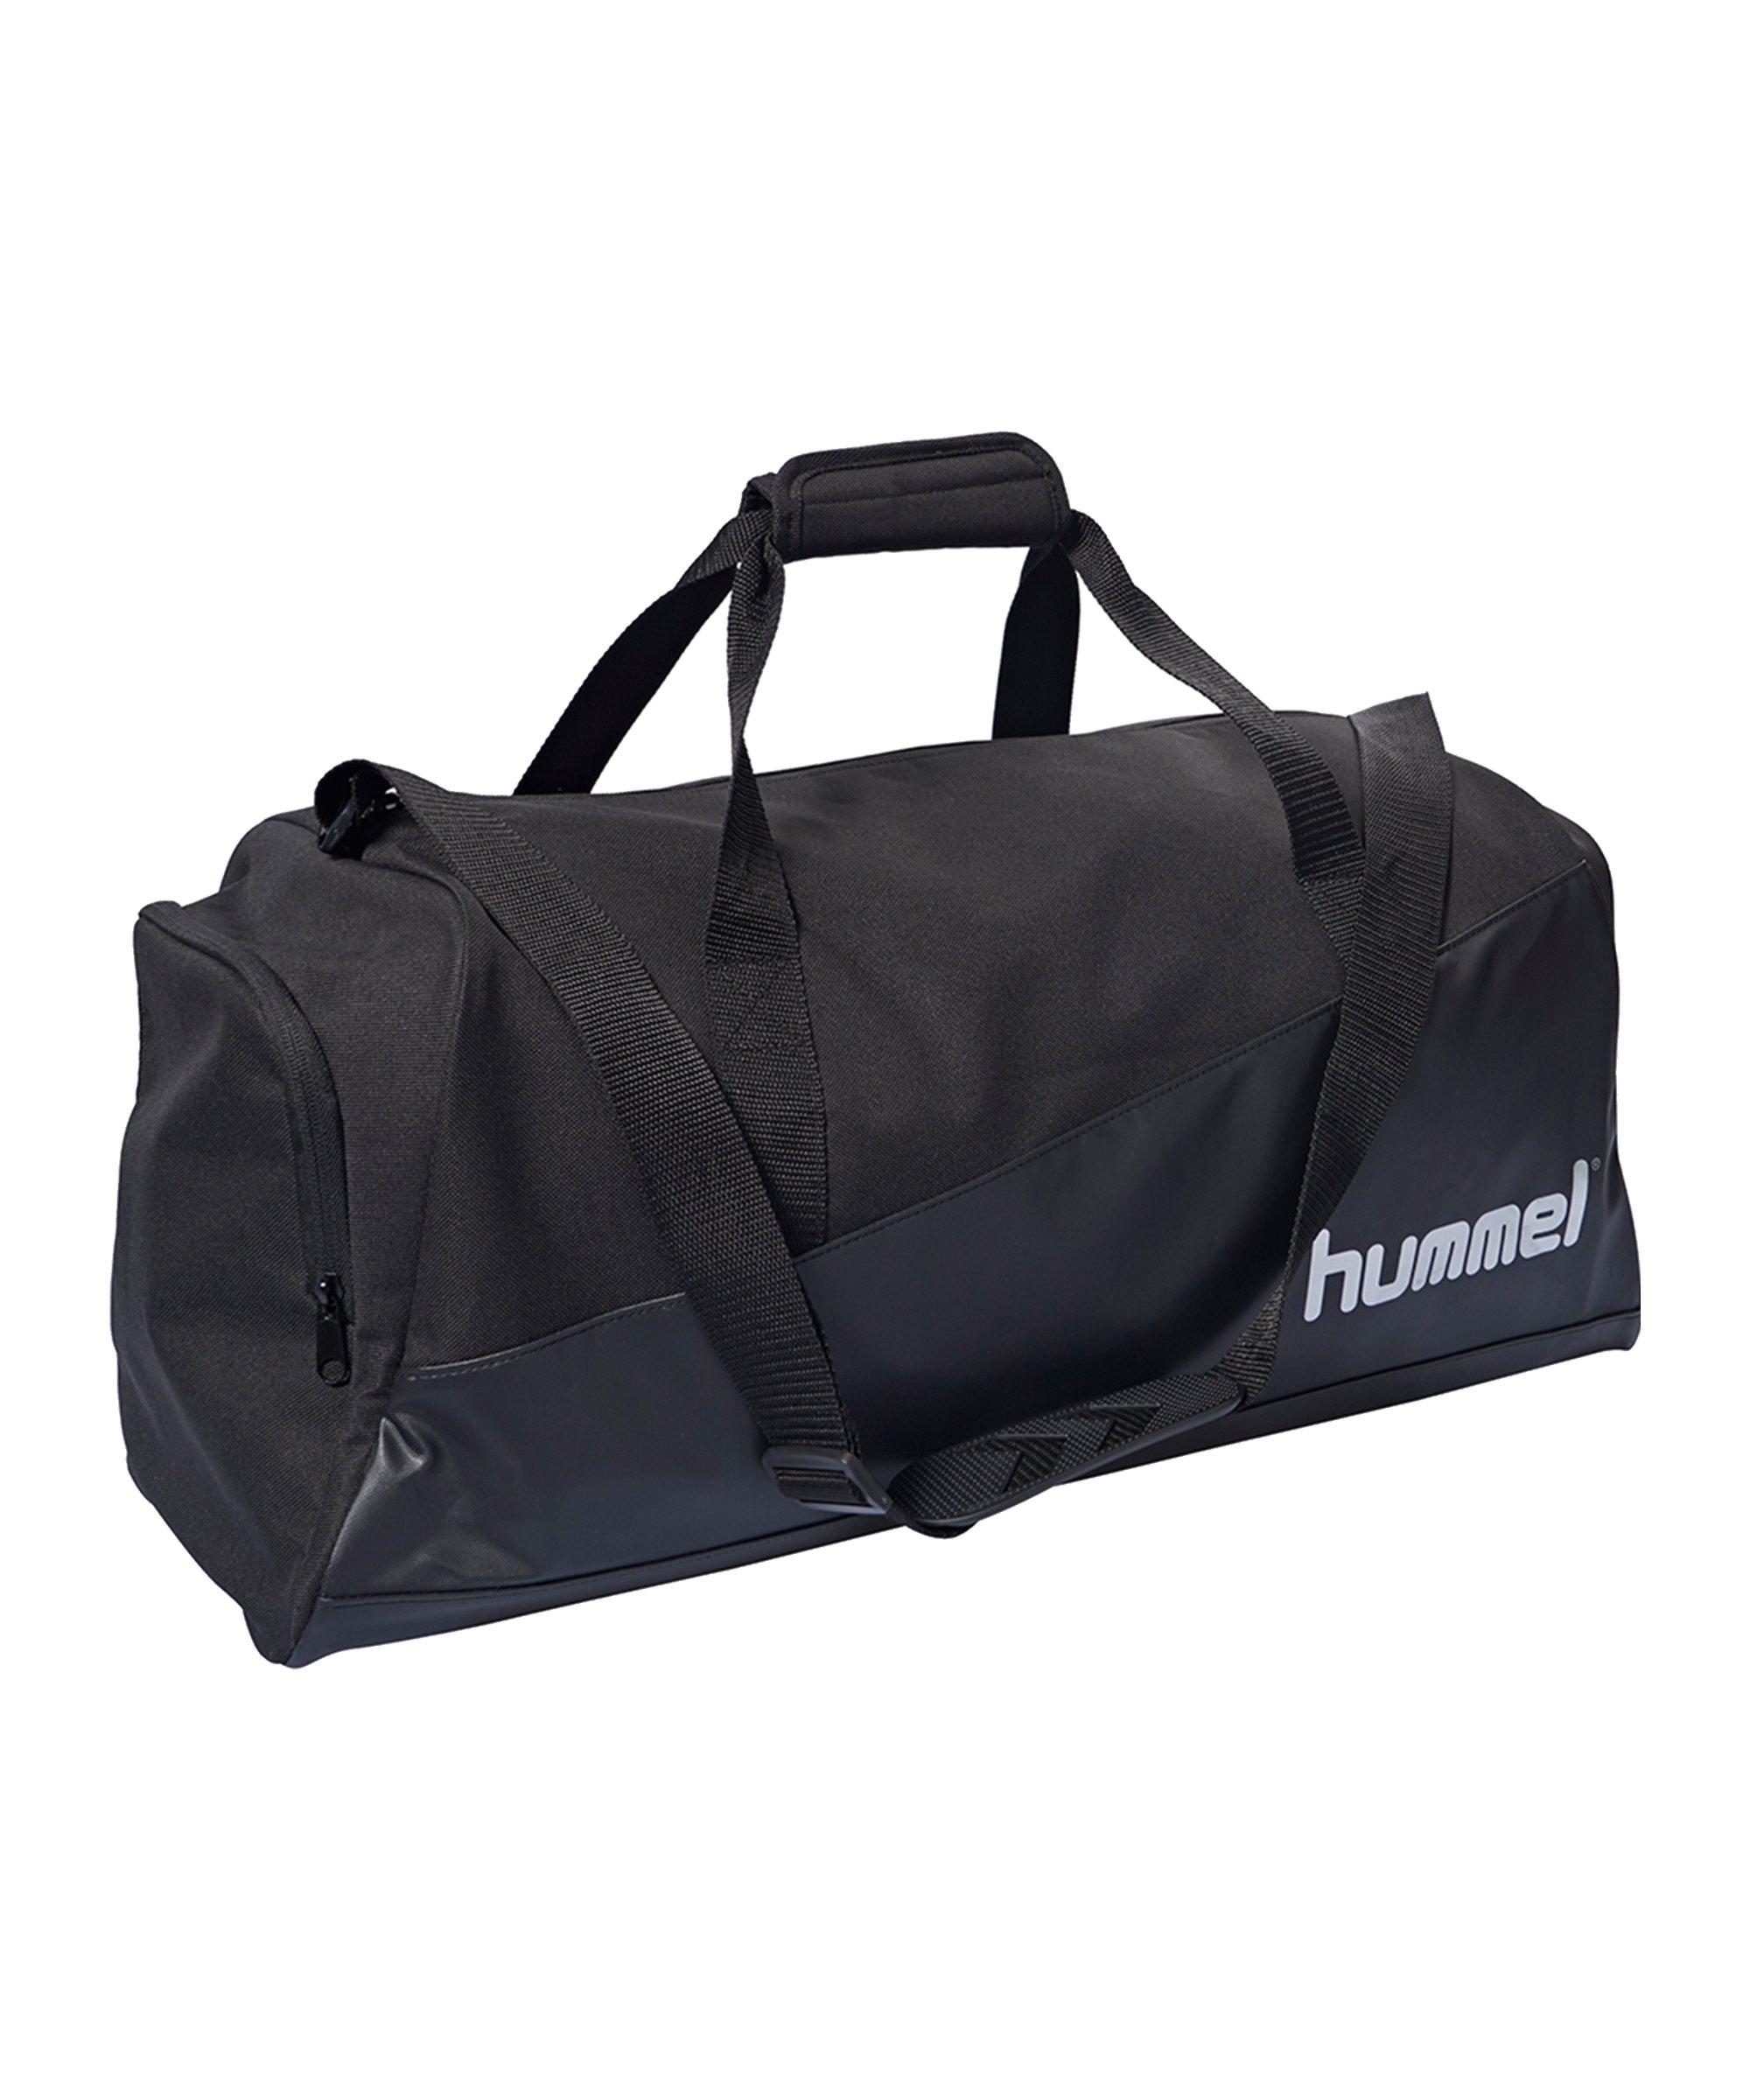 Hummel Authentic Charge L Sporttasche F2001 - schwarz